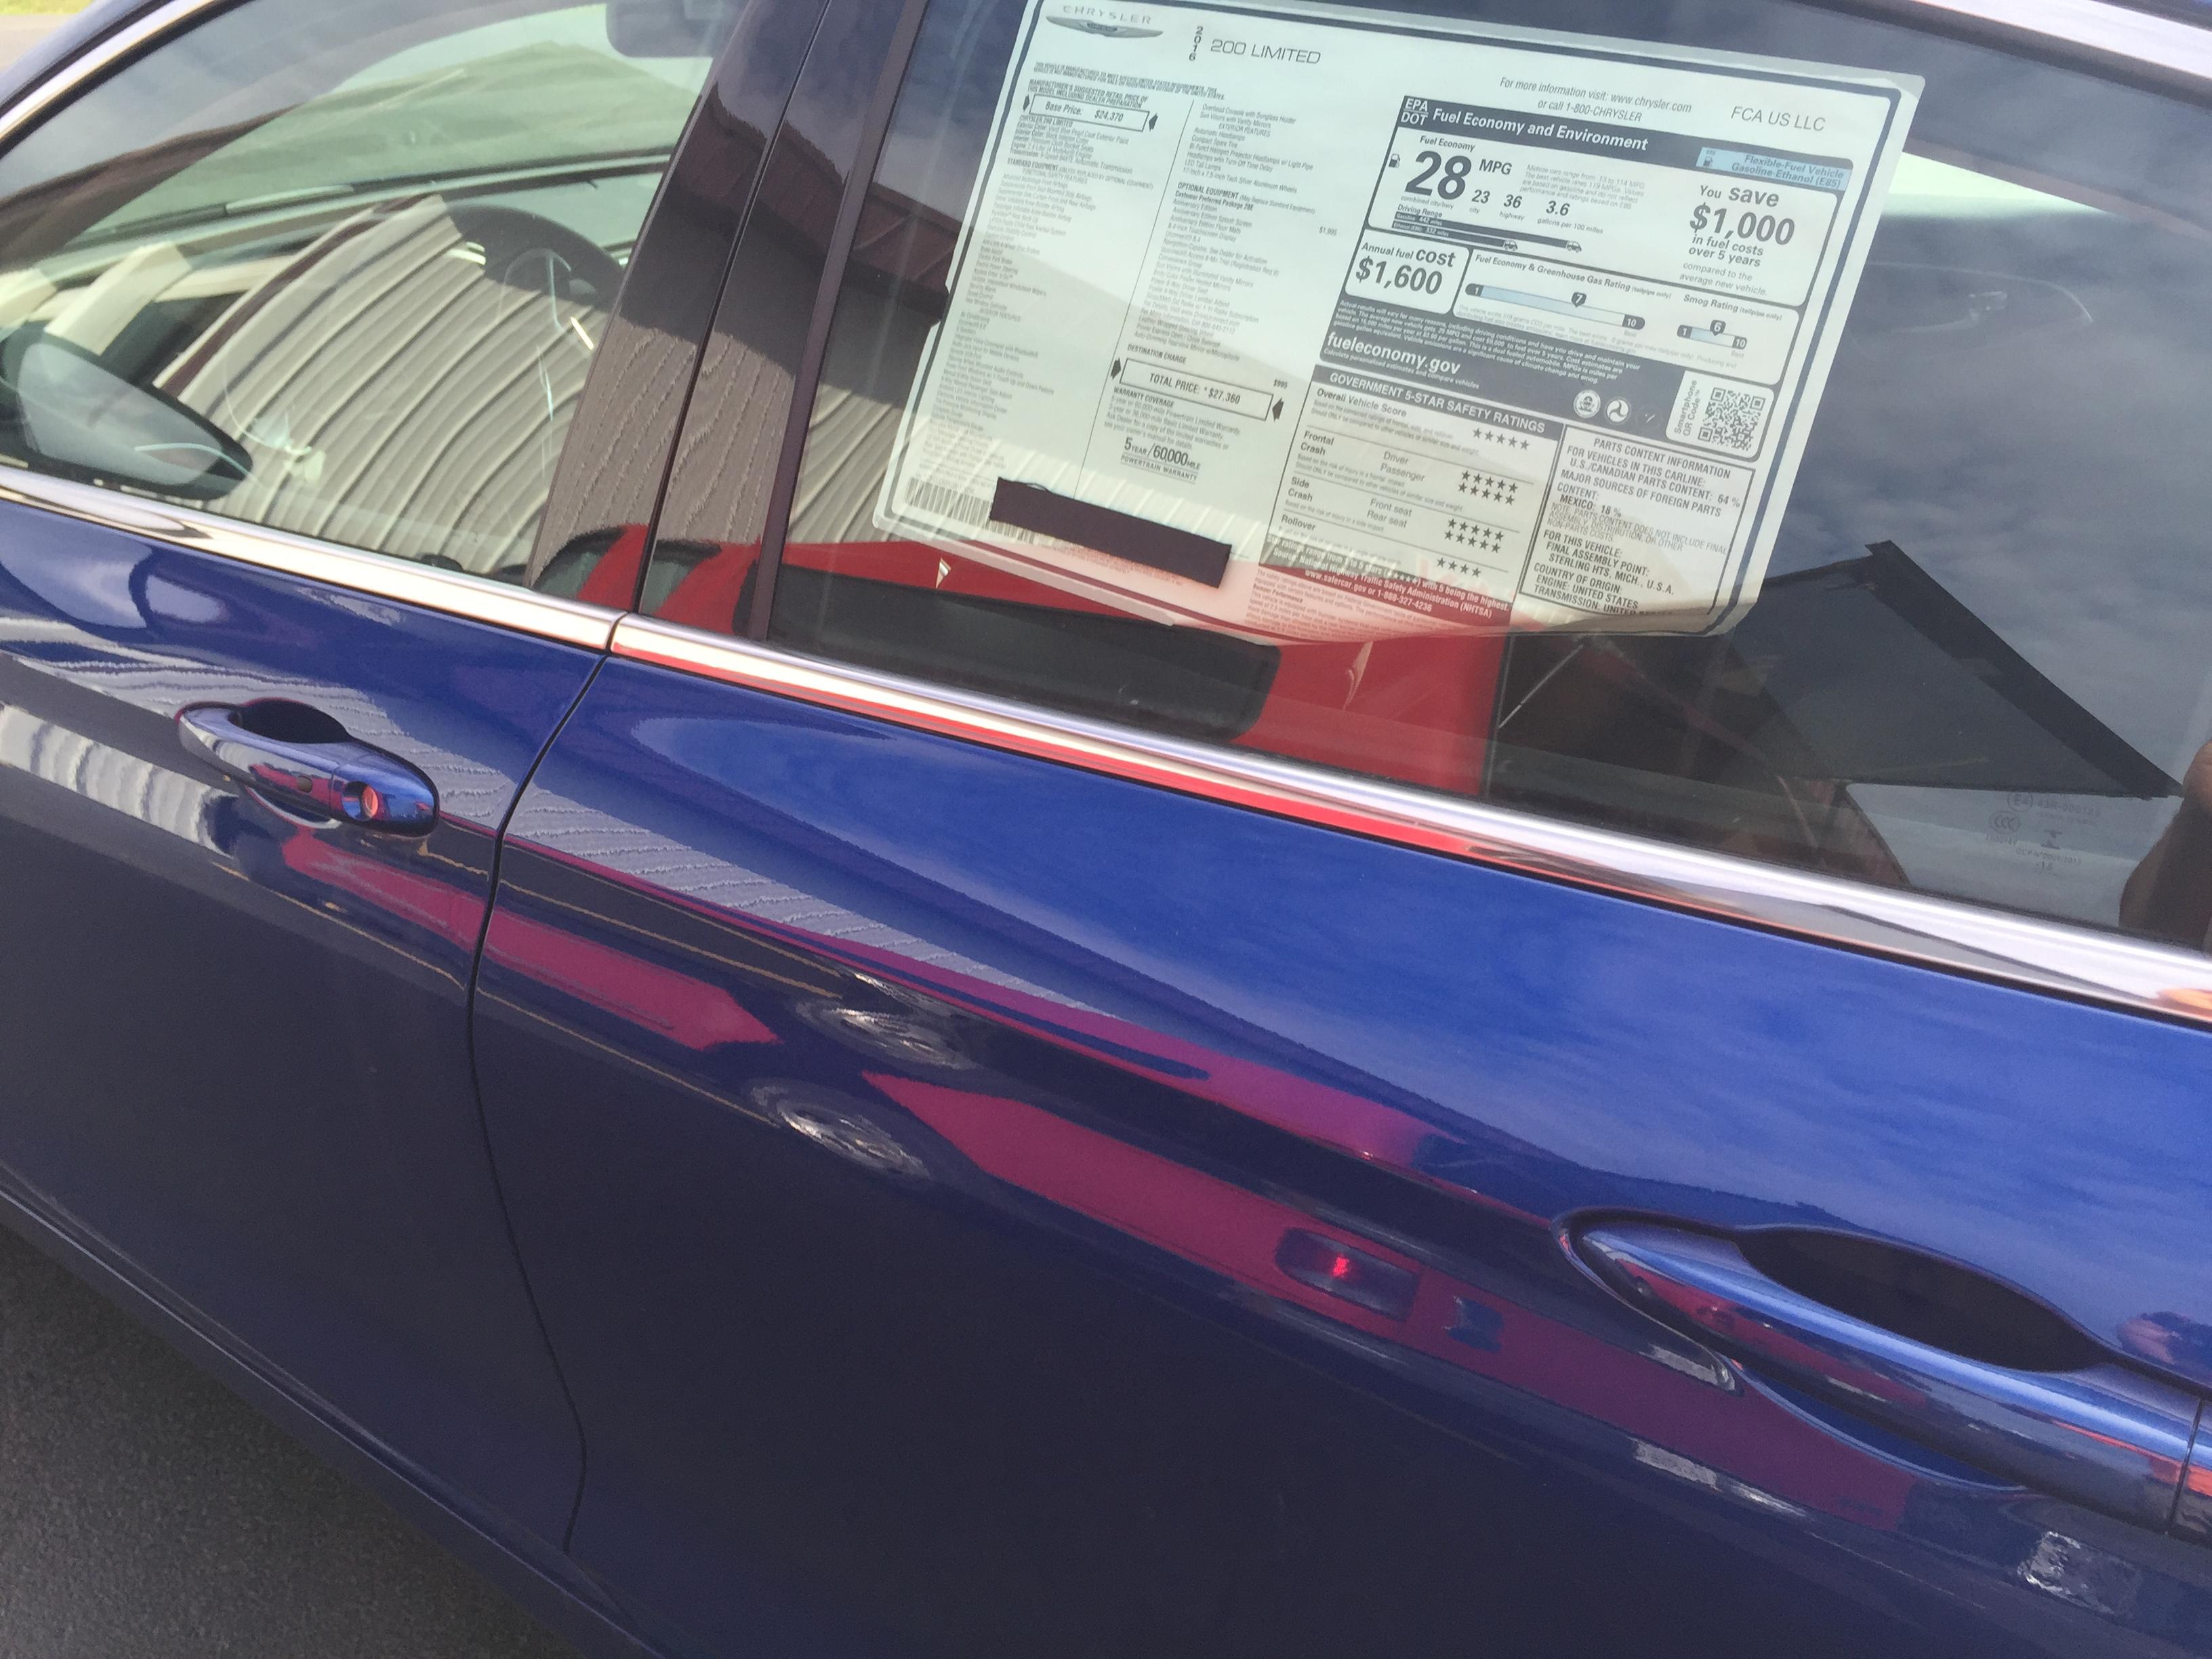 2016 Chrysler 200 Drivers rear door, Mobile Dent Repair Springfield Il